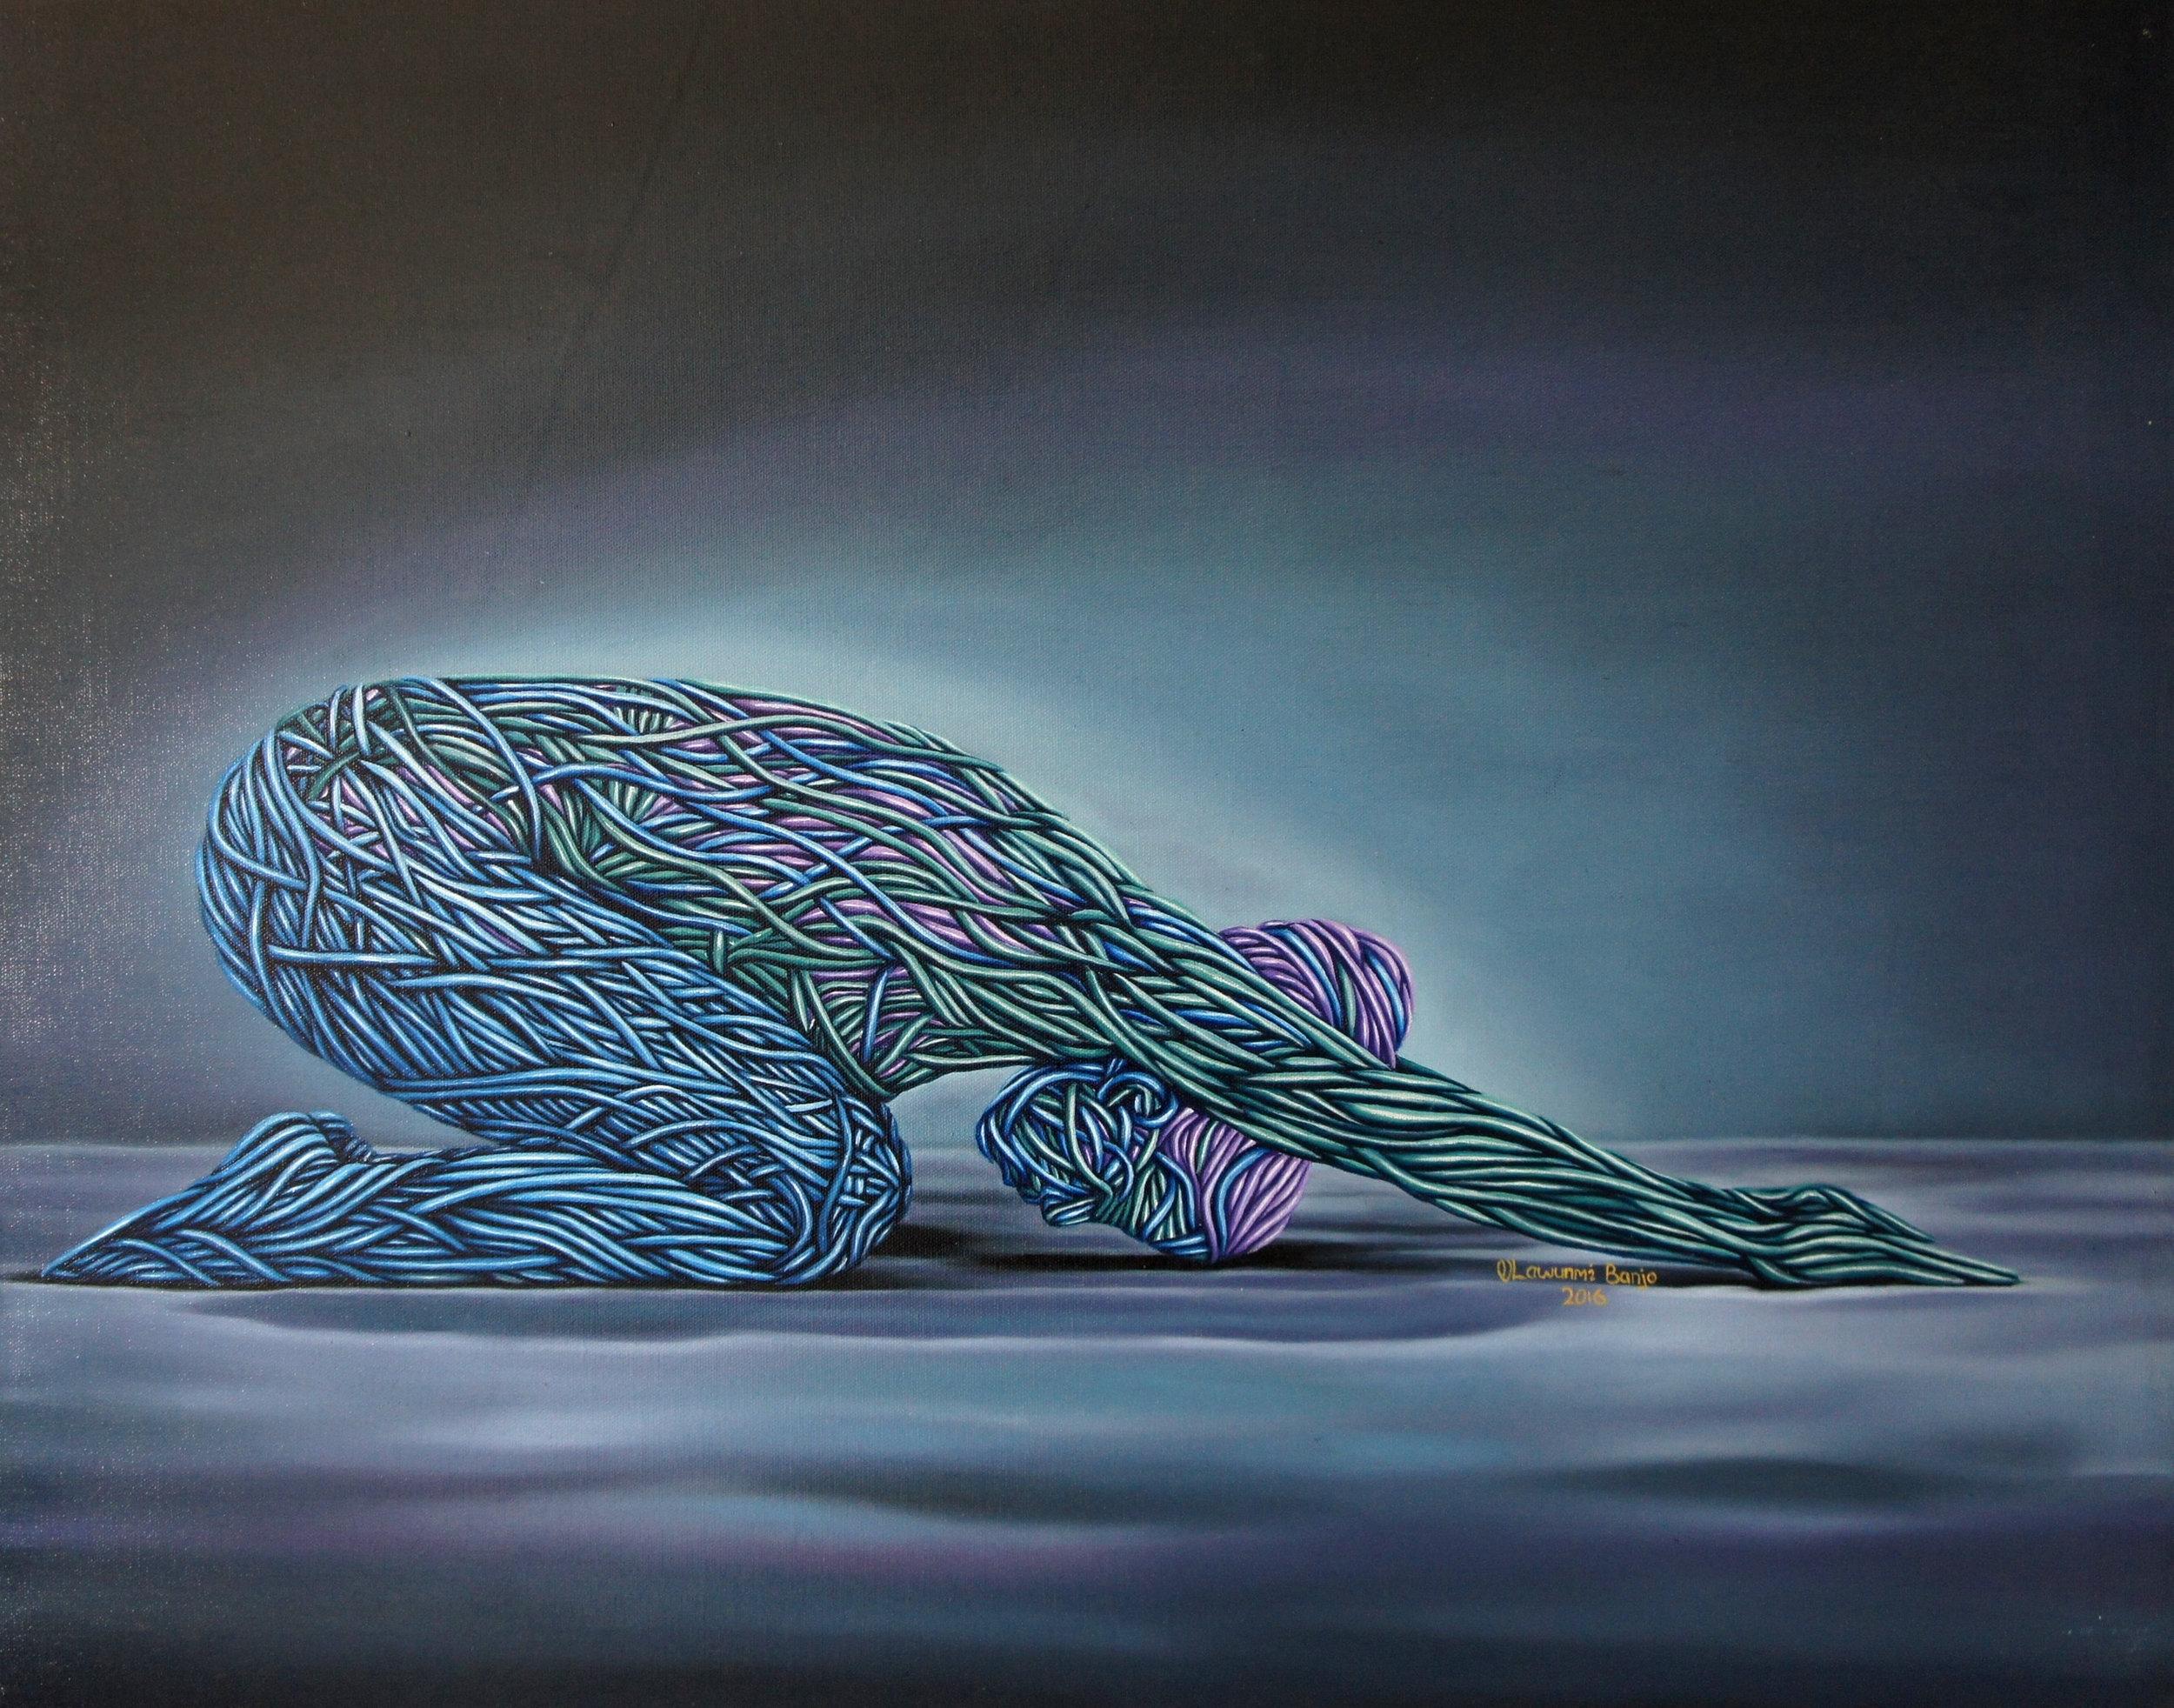 Recess, Oil on canvas, 56 x 71 cm, 2016, Olawunmi Banjo